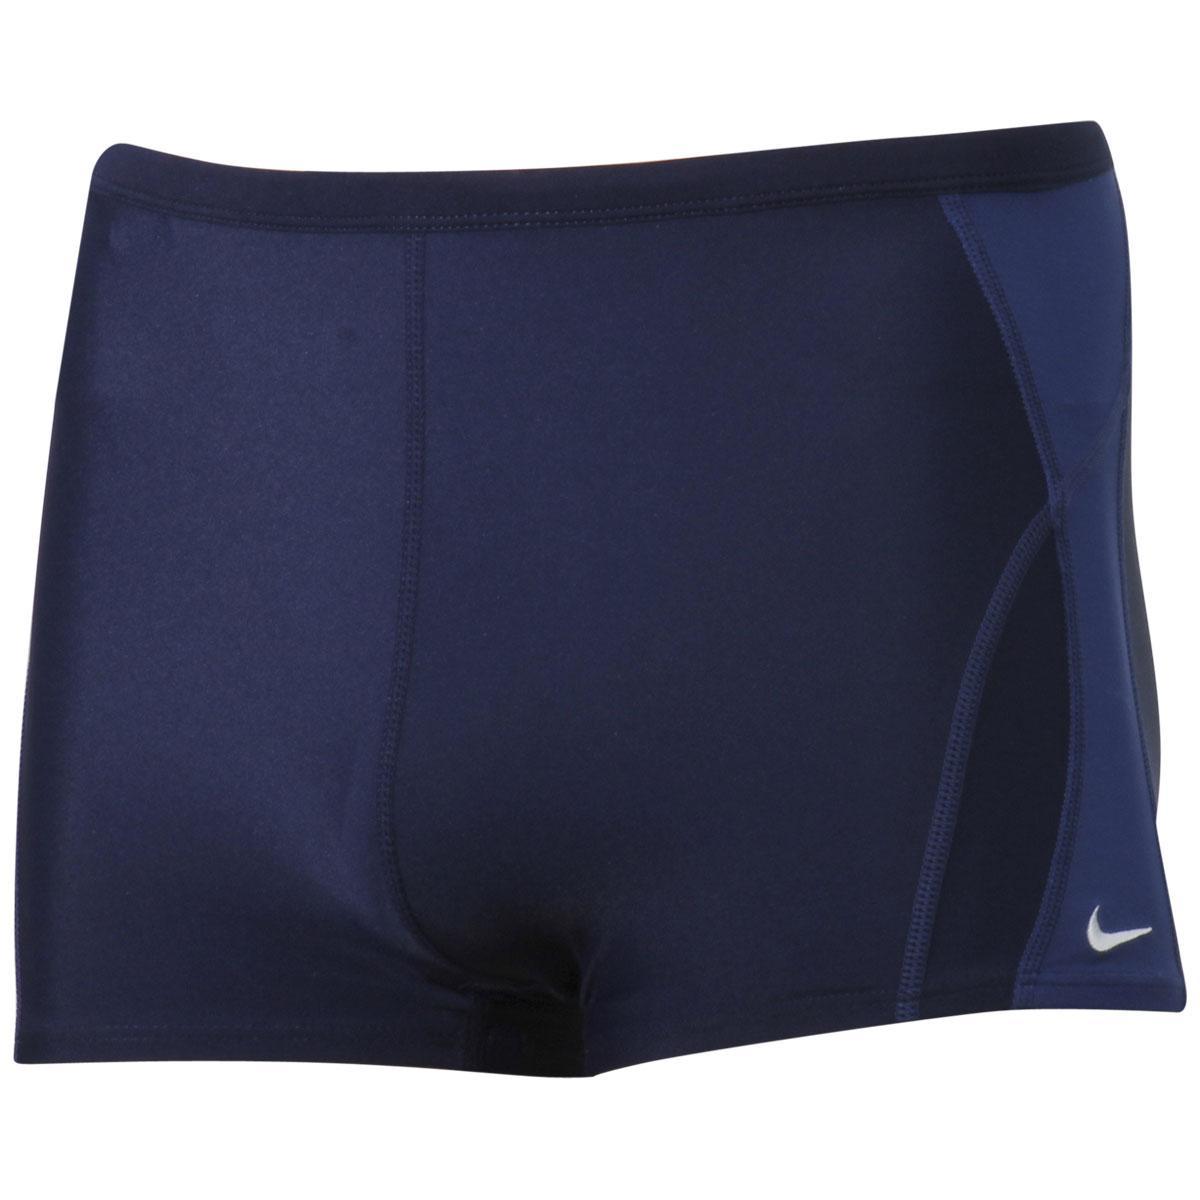 Nike Men's Poly Core Solids Square Leg Performance Swimwear